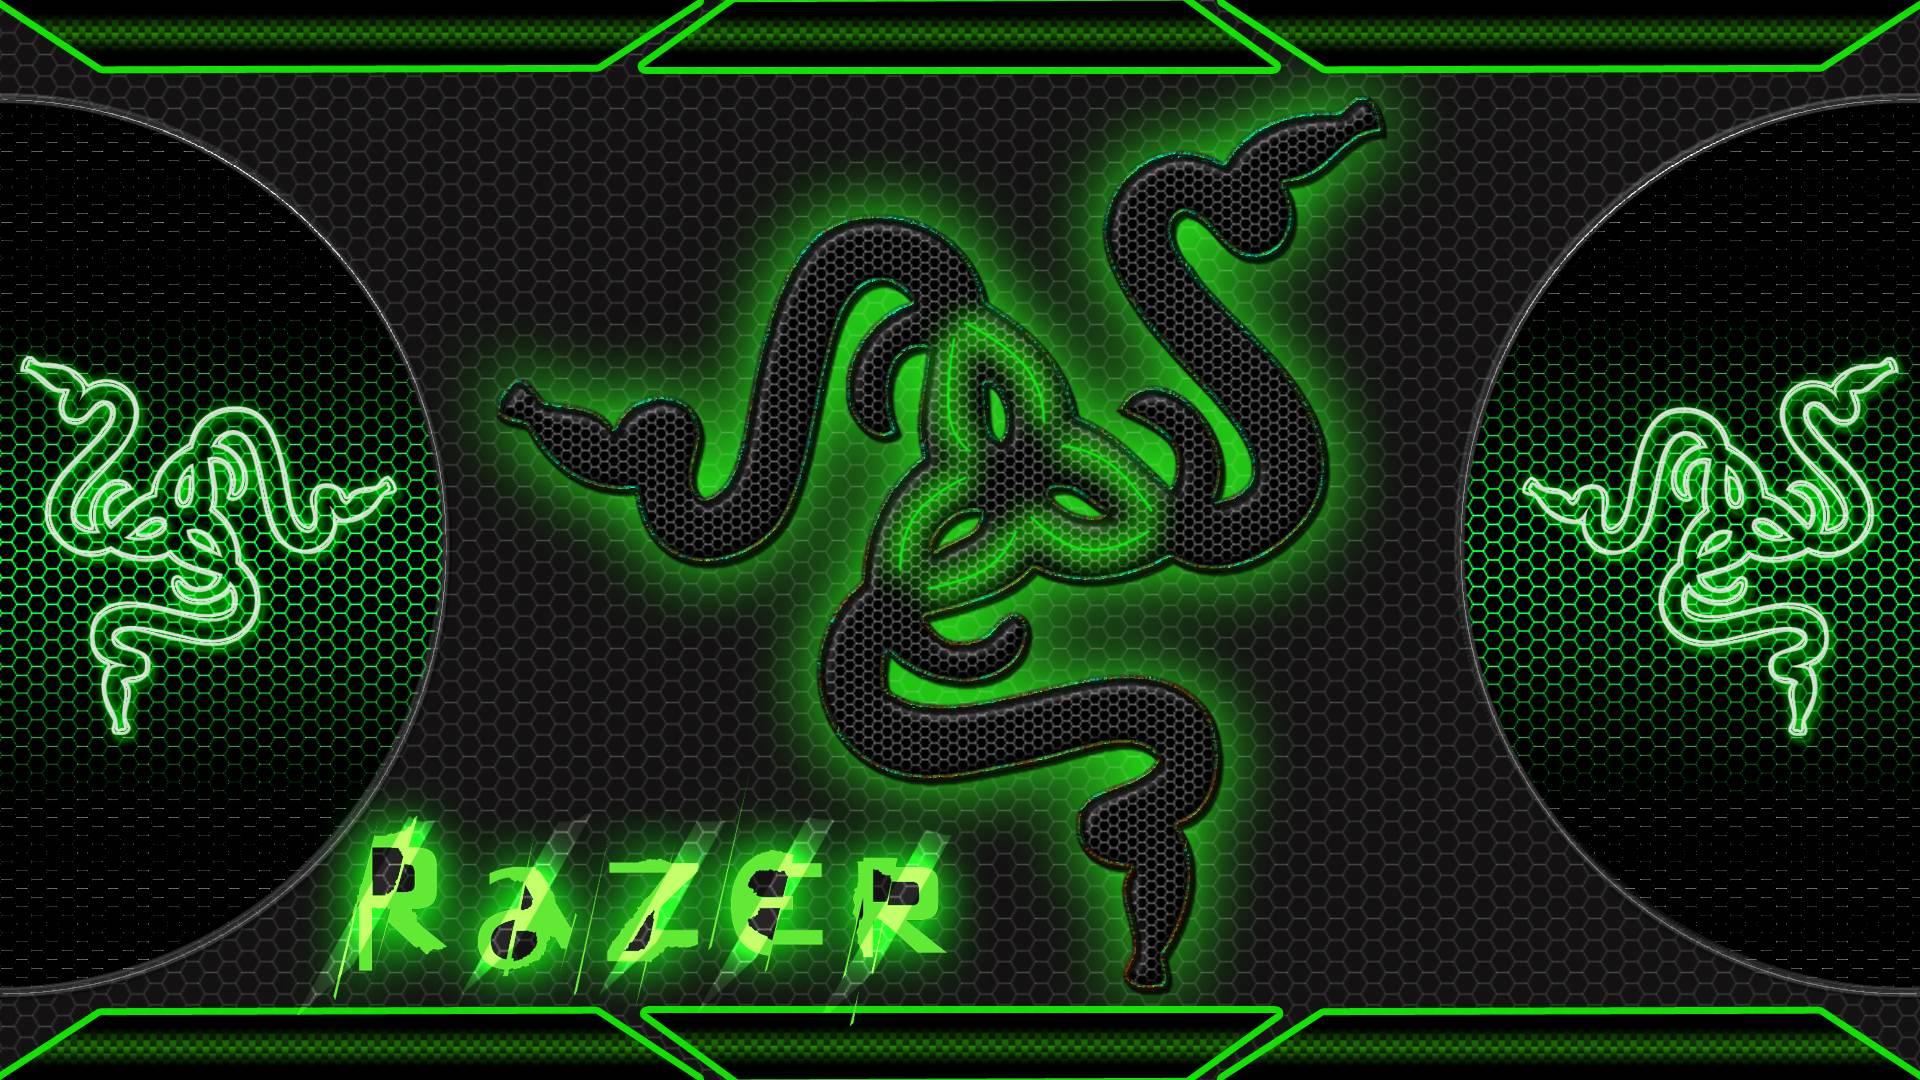 razor wallpaper computer - photo #12